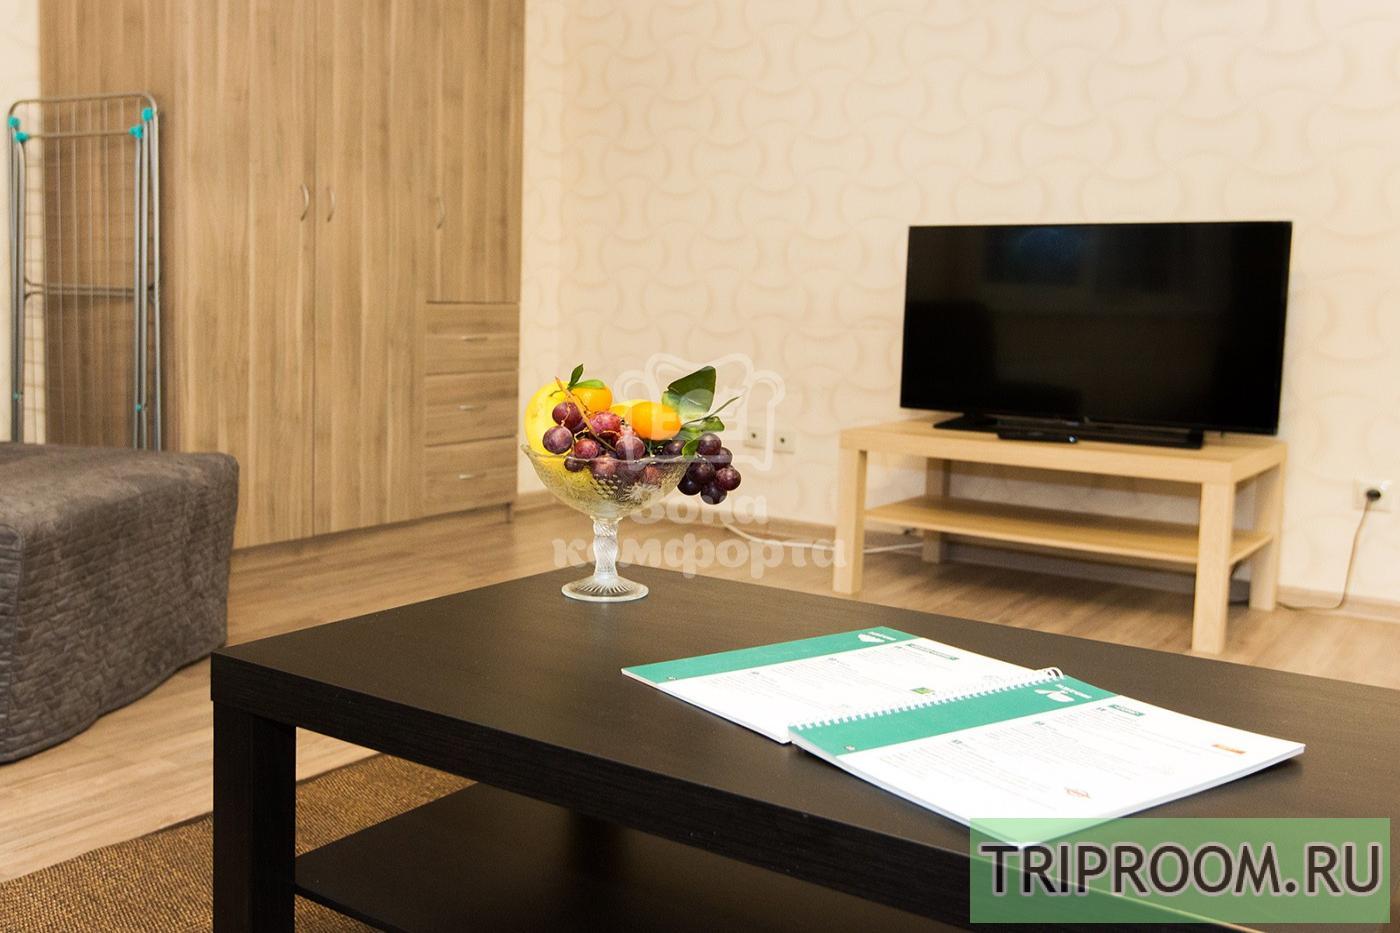 2-комнатная квартира посуточно (вариант № 34715), ул. Гагарина бульвар, фото № 21